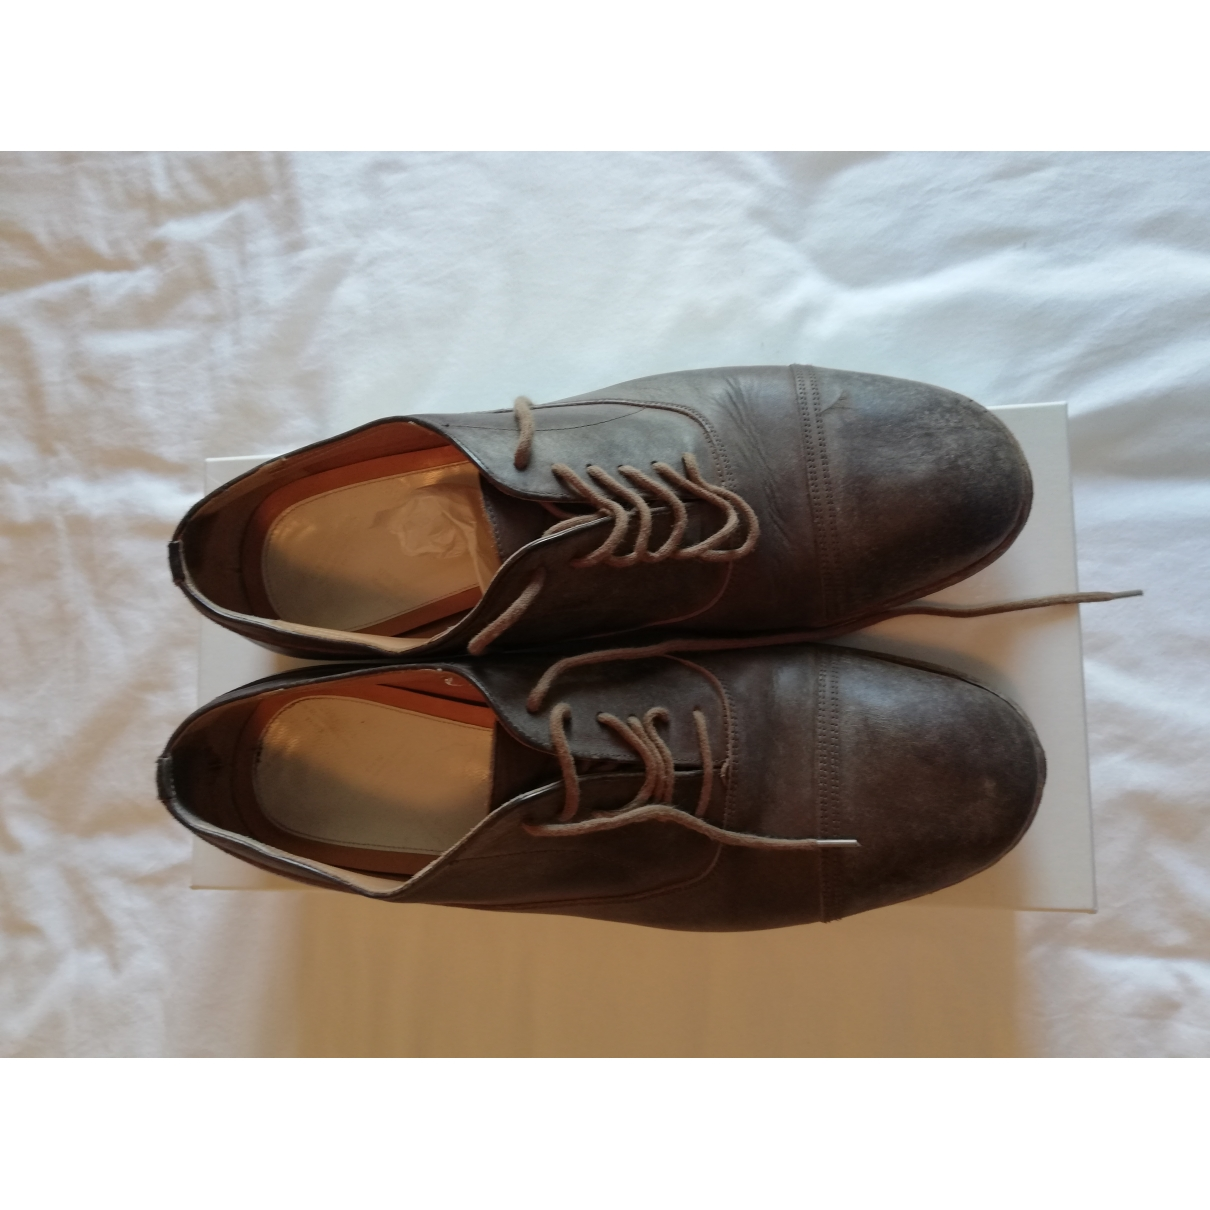 Maison Martin Margiela \N Brown Leather Lace ups for Men 42 EU